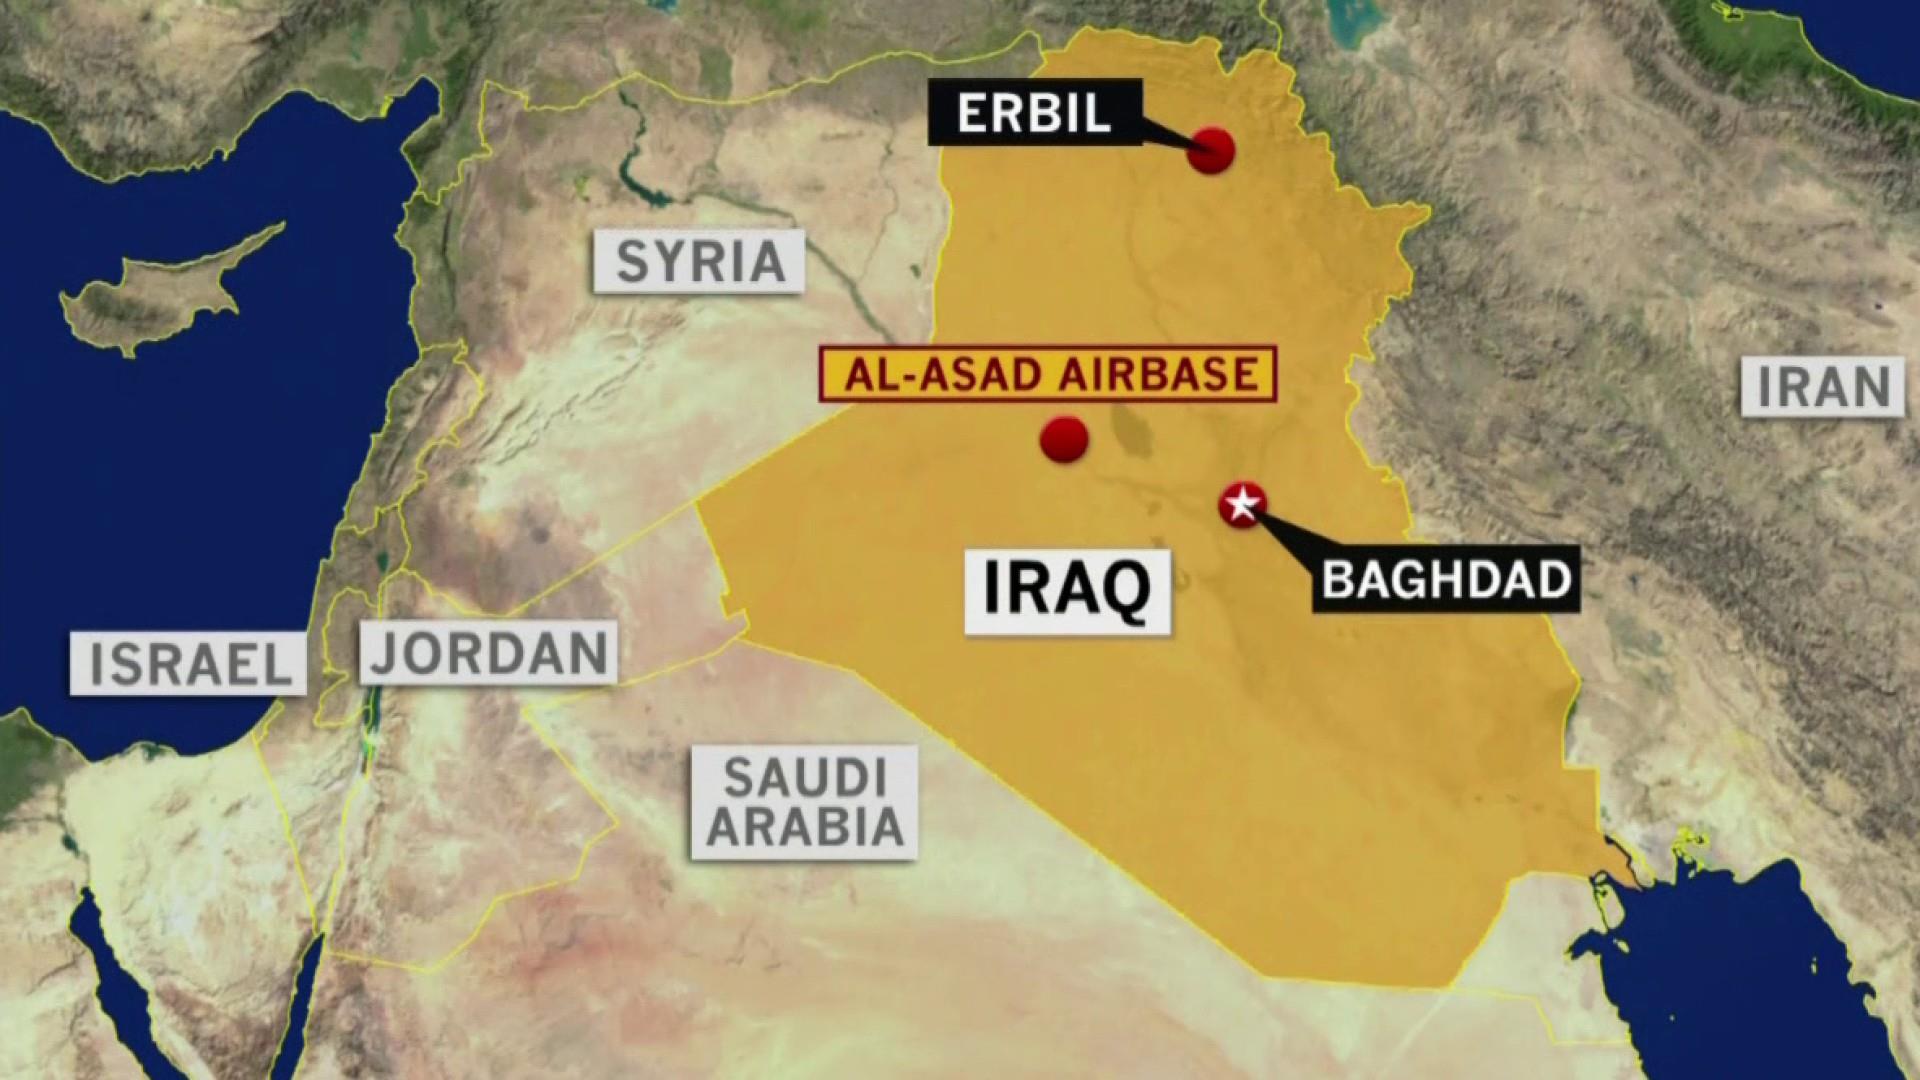 Iran retaliates for Gen. Soleimani's killing by firing missiles at U.S. forces in Iraq